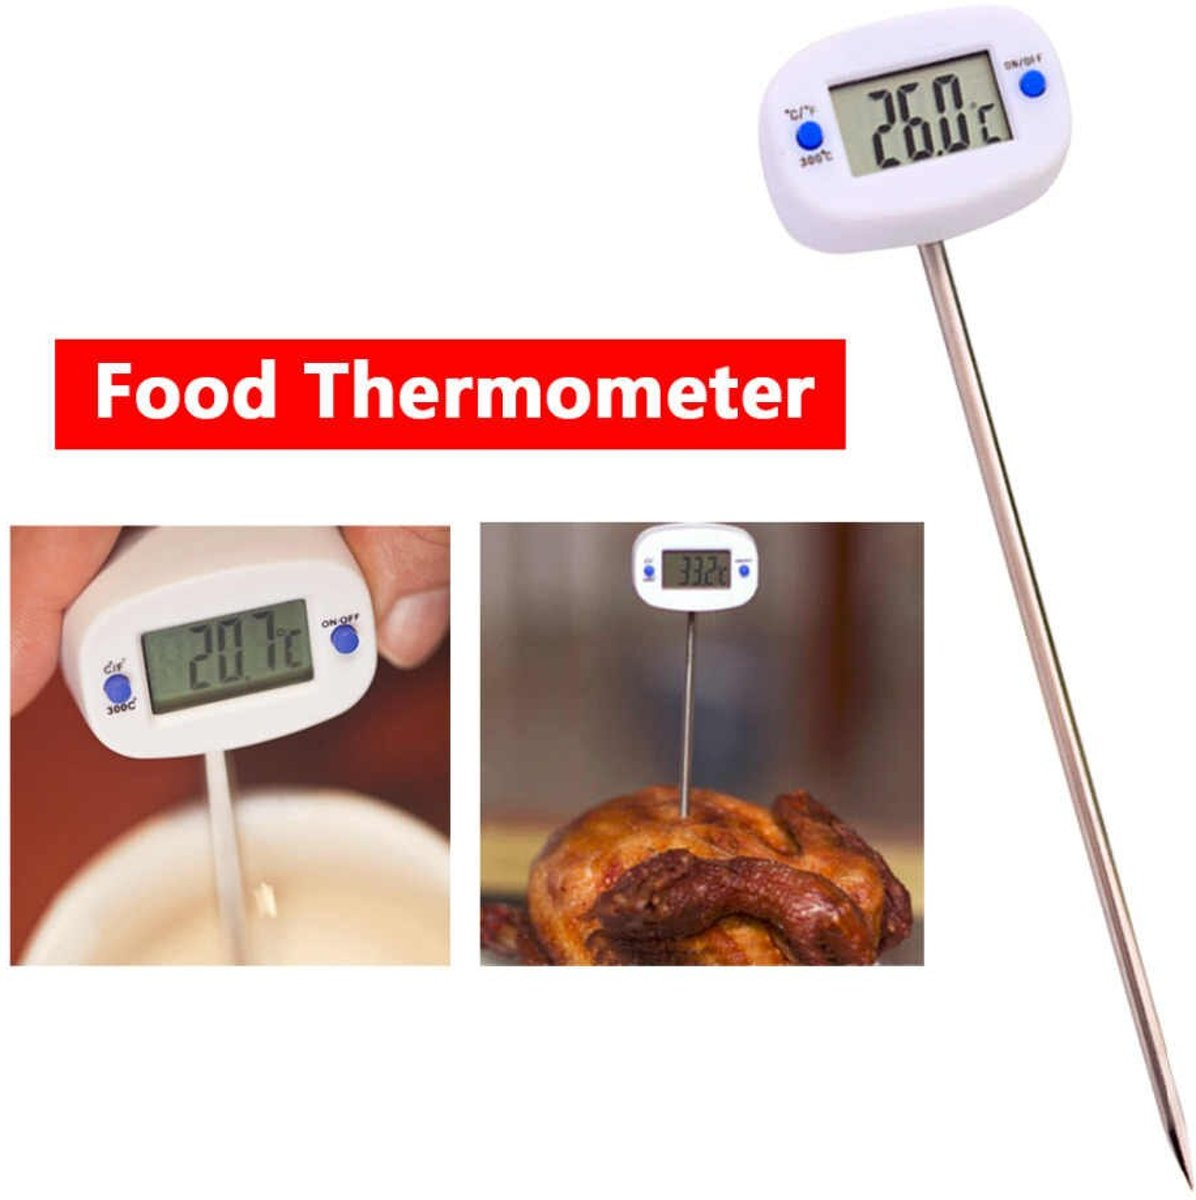 Professionele Digitale Keukenthermometer – -50° tot 300° celcius - Incl. Batterij kopen